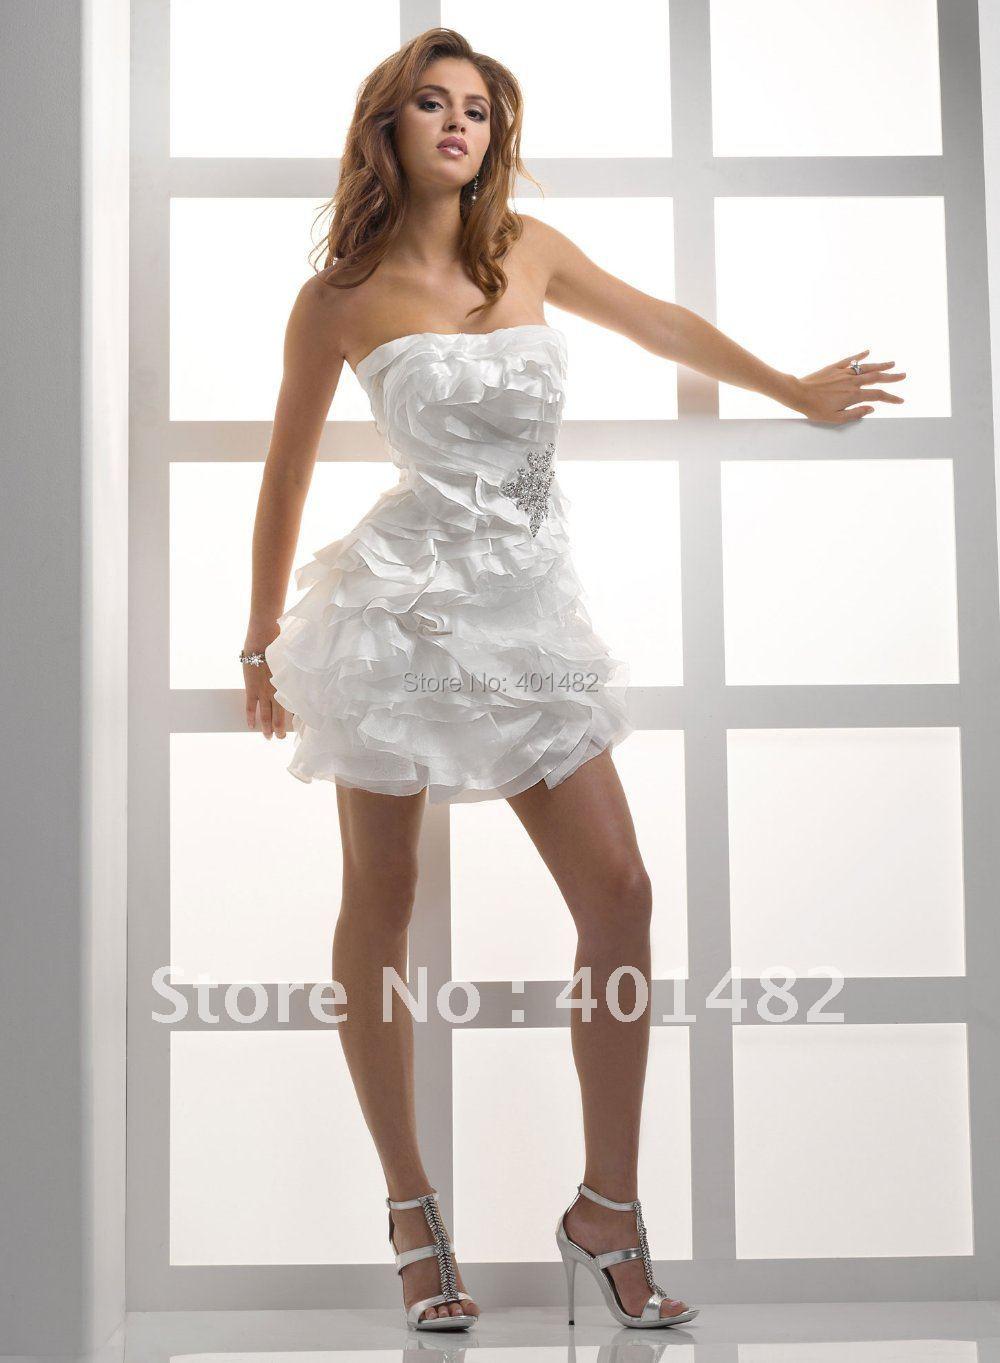 david tutera wedding dresses bridal fashion week spring straight wedding dresses David Tutera Spring sleeveless mermaid gown with paisley beaded embroidery and illusion keyhole